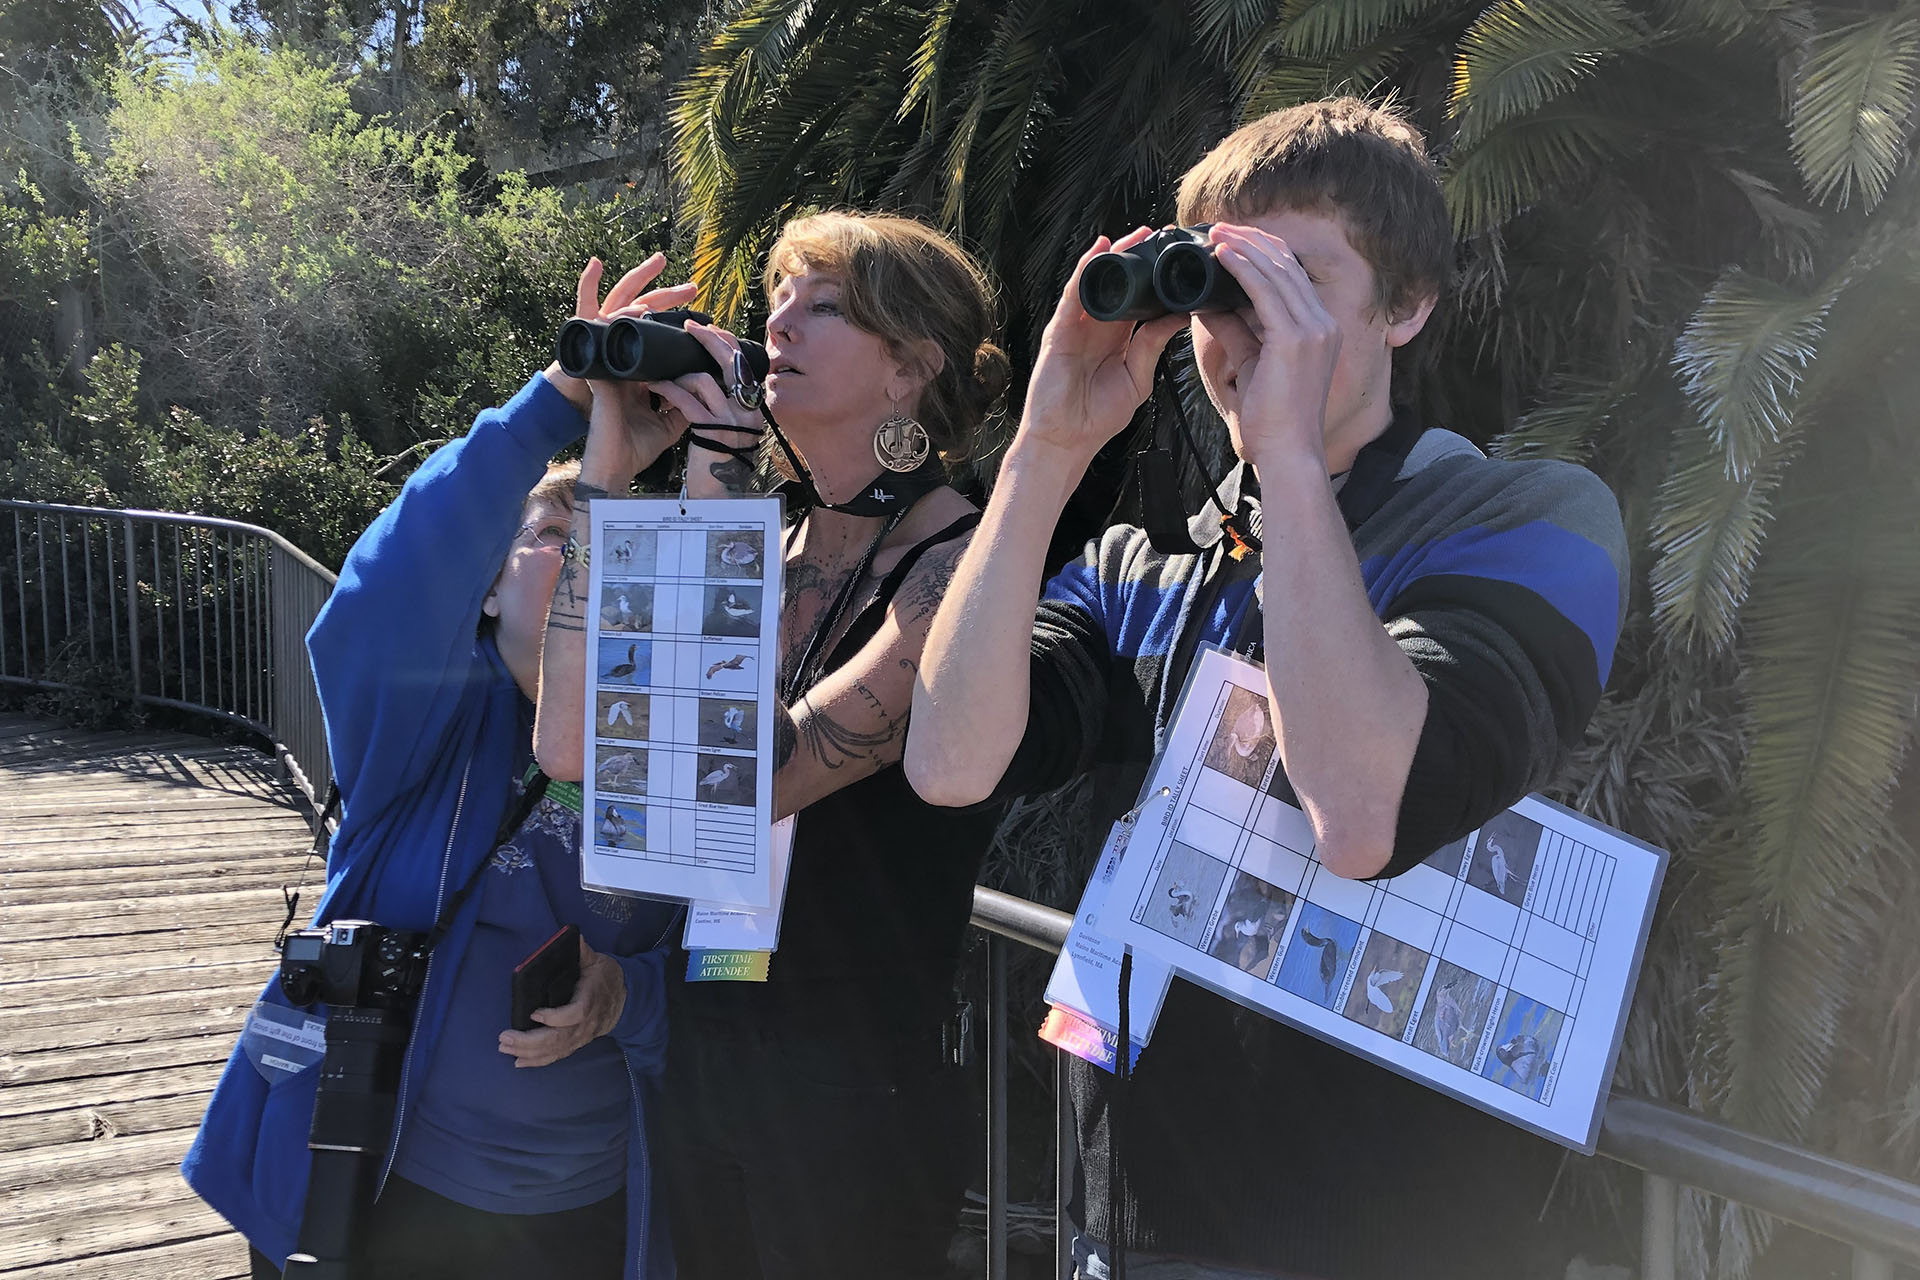 Focusing binoculars